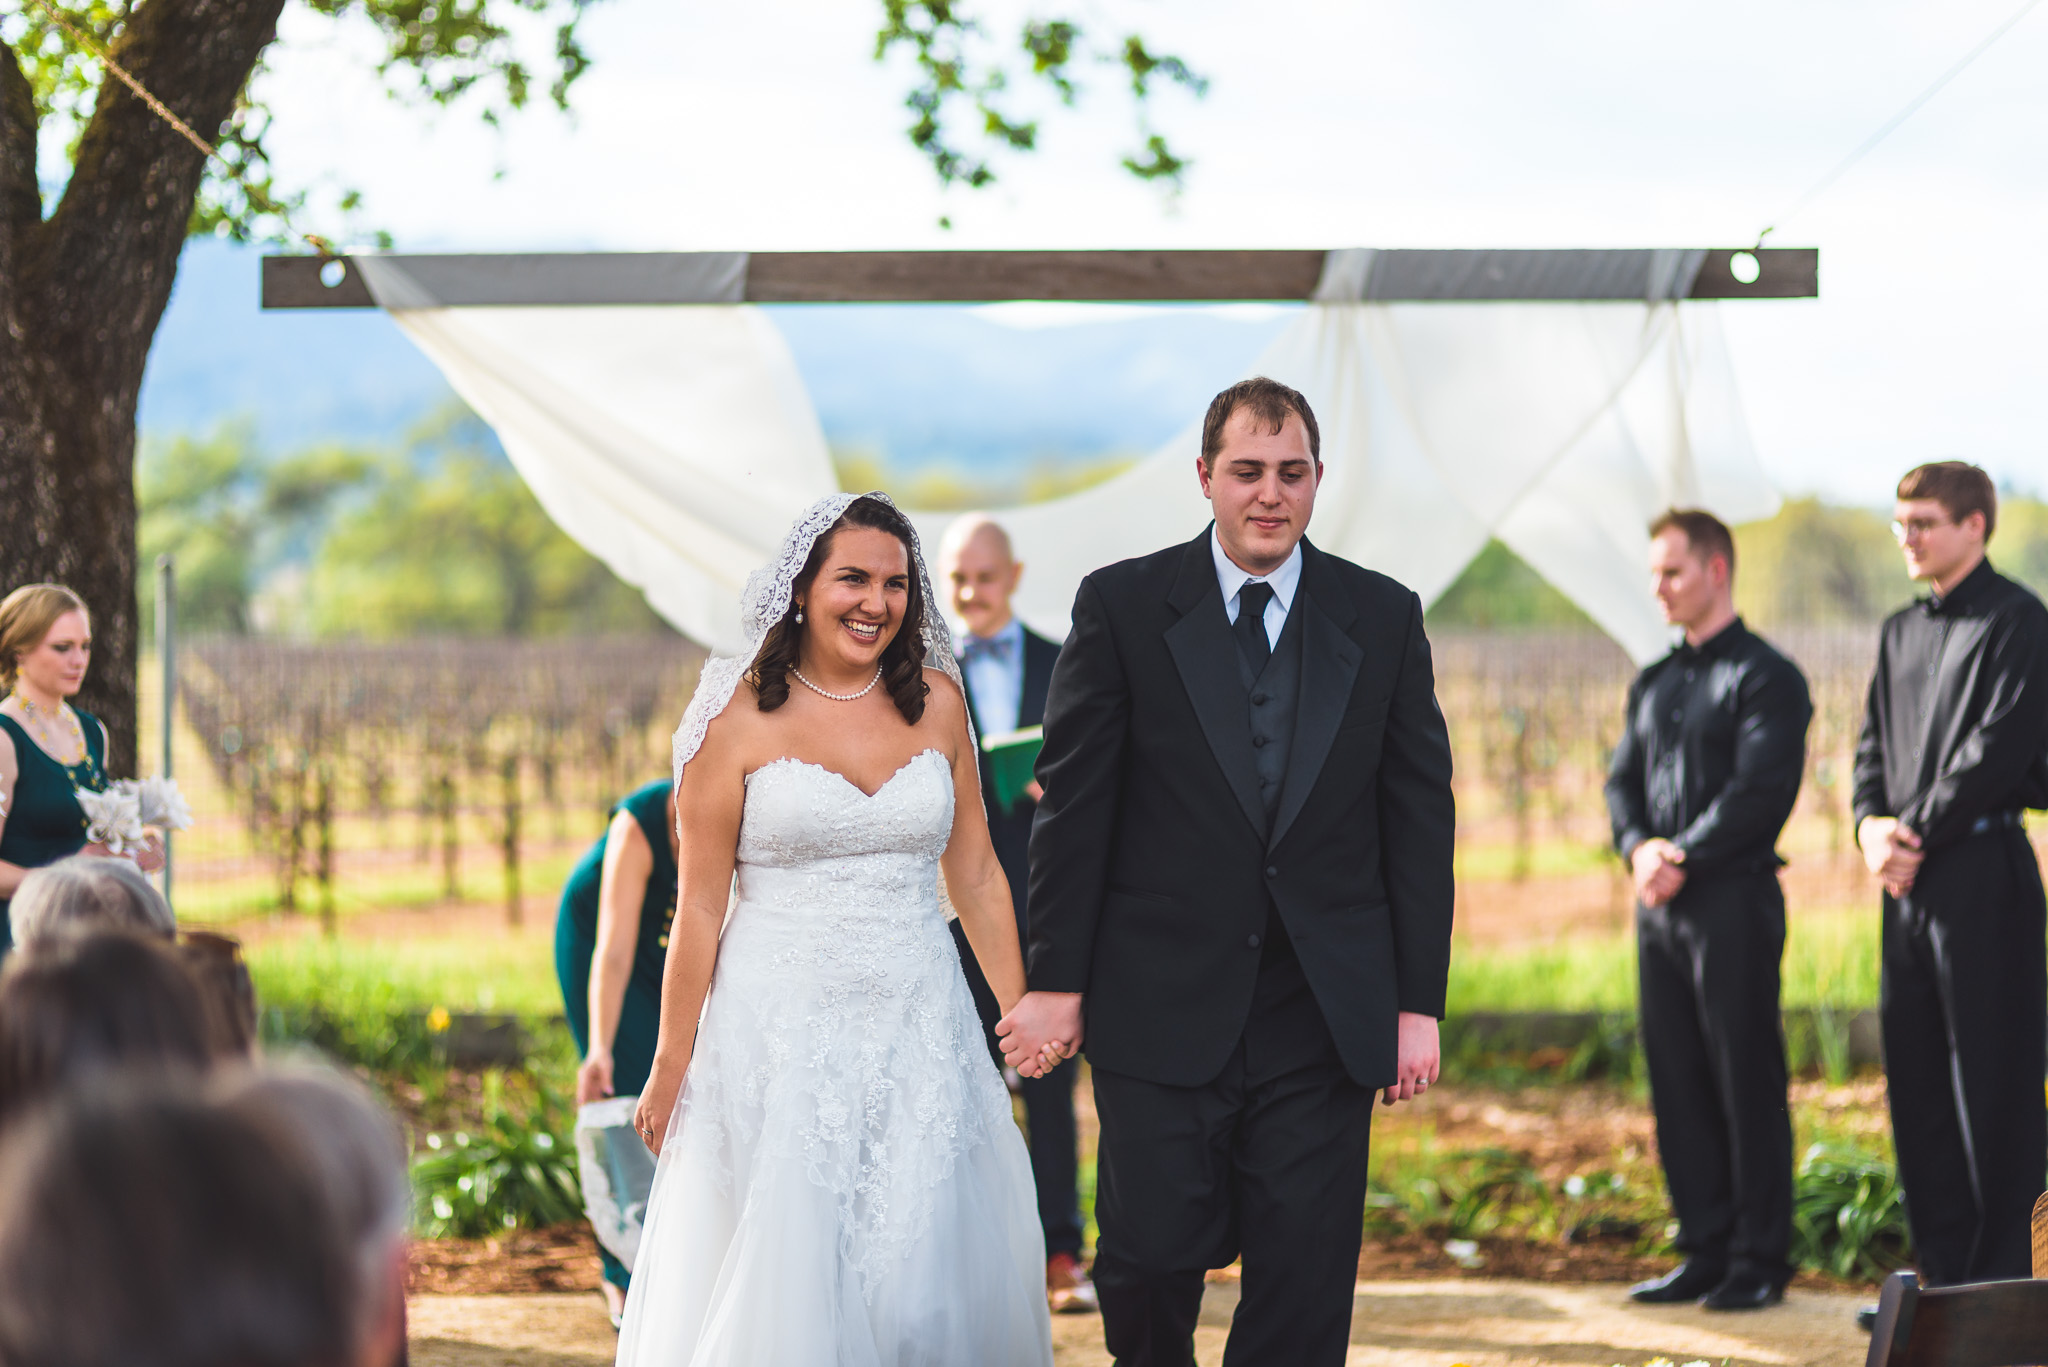 Sonoma_Backyard_Wedding-Chuck_Caroline-038.jpg